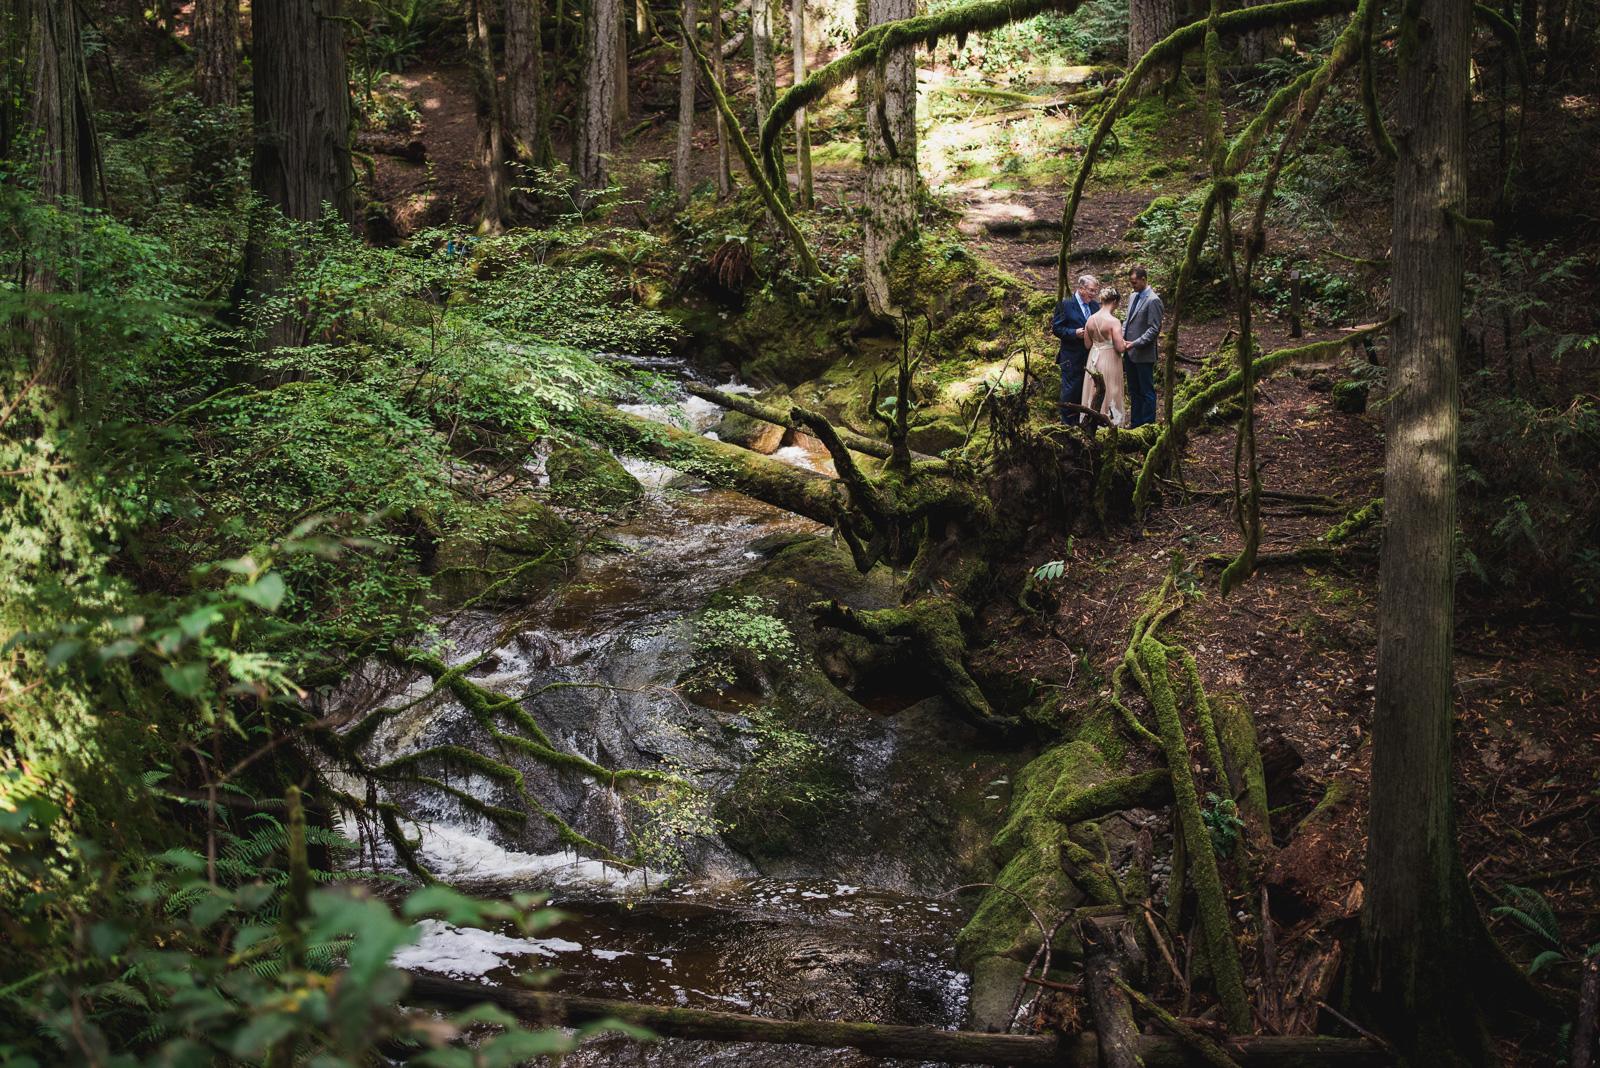 vancouver-island-wedding-photographers-cliff-gilker-park-smugglers-cove-elopement-3.jpg